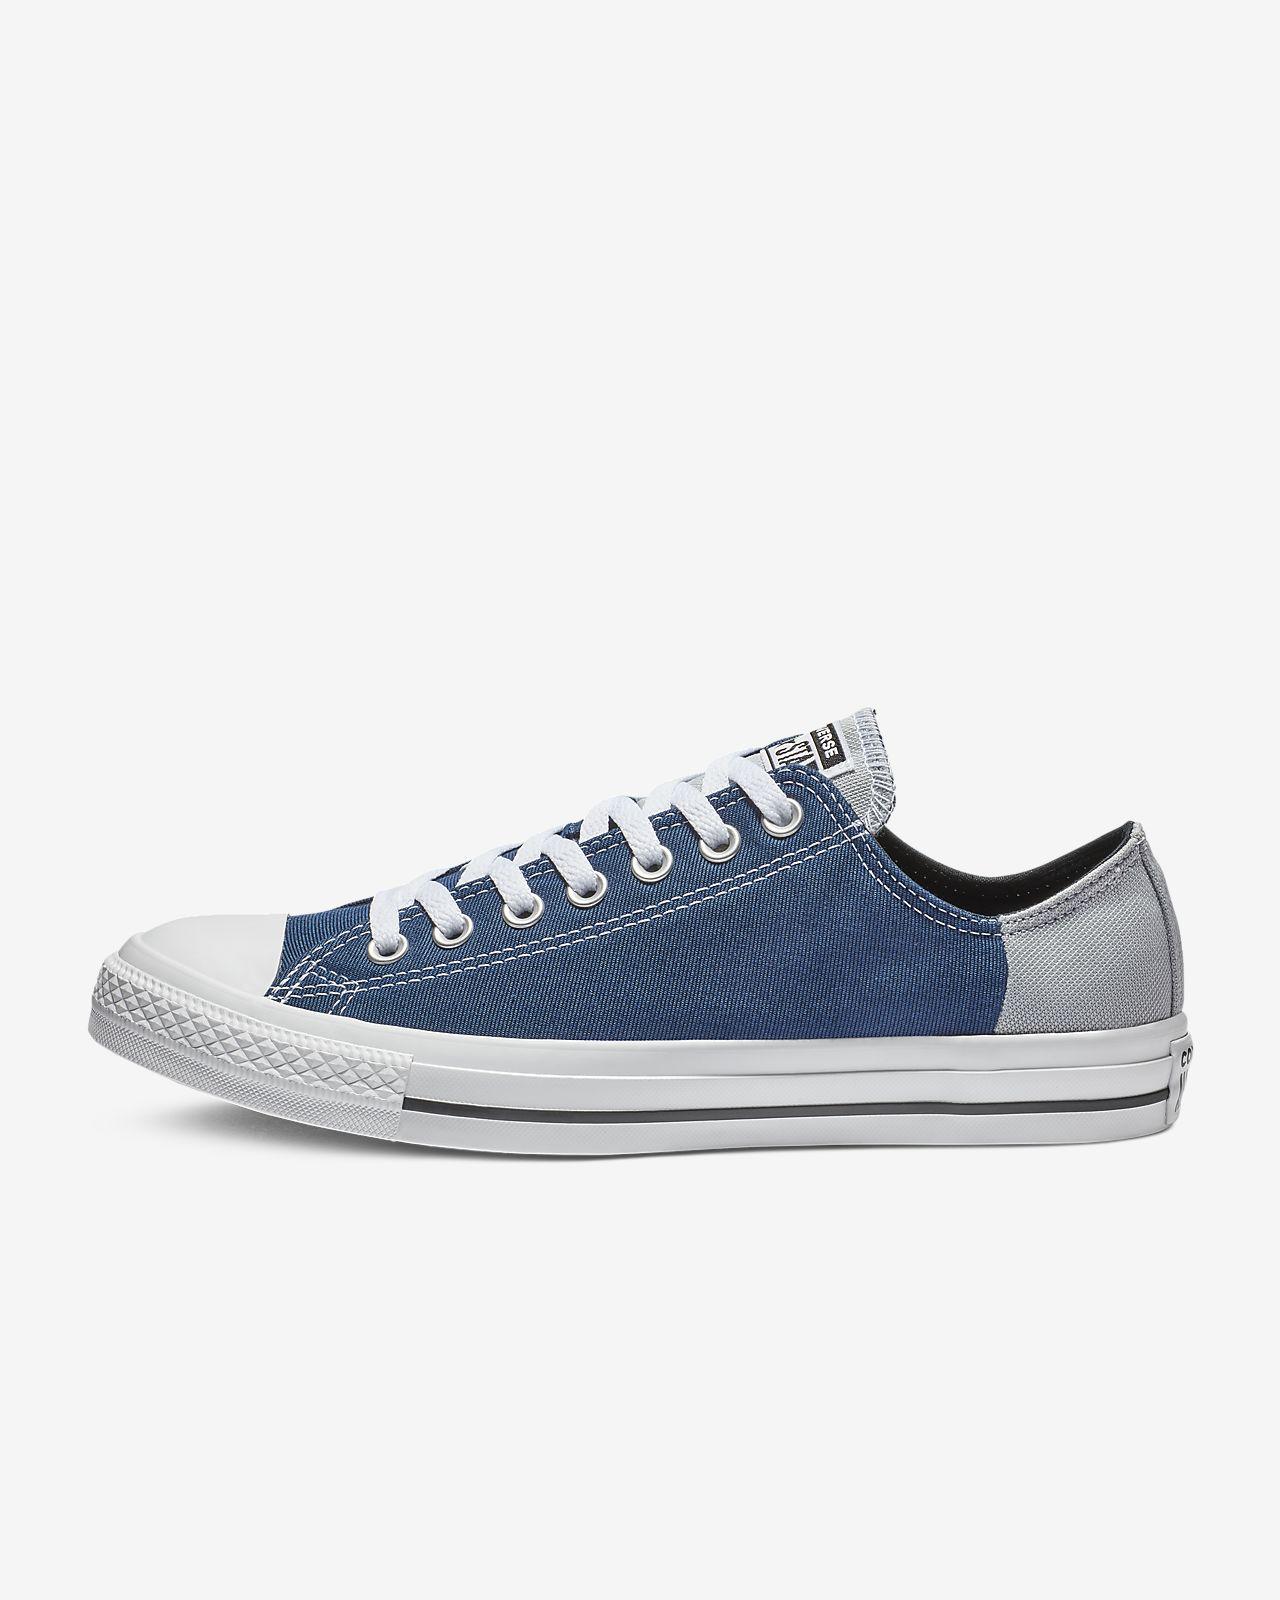 Converse Chuck Taylor All Star Unisex Shoe